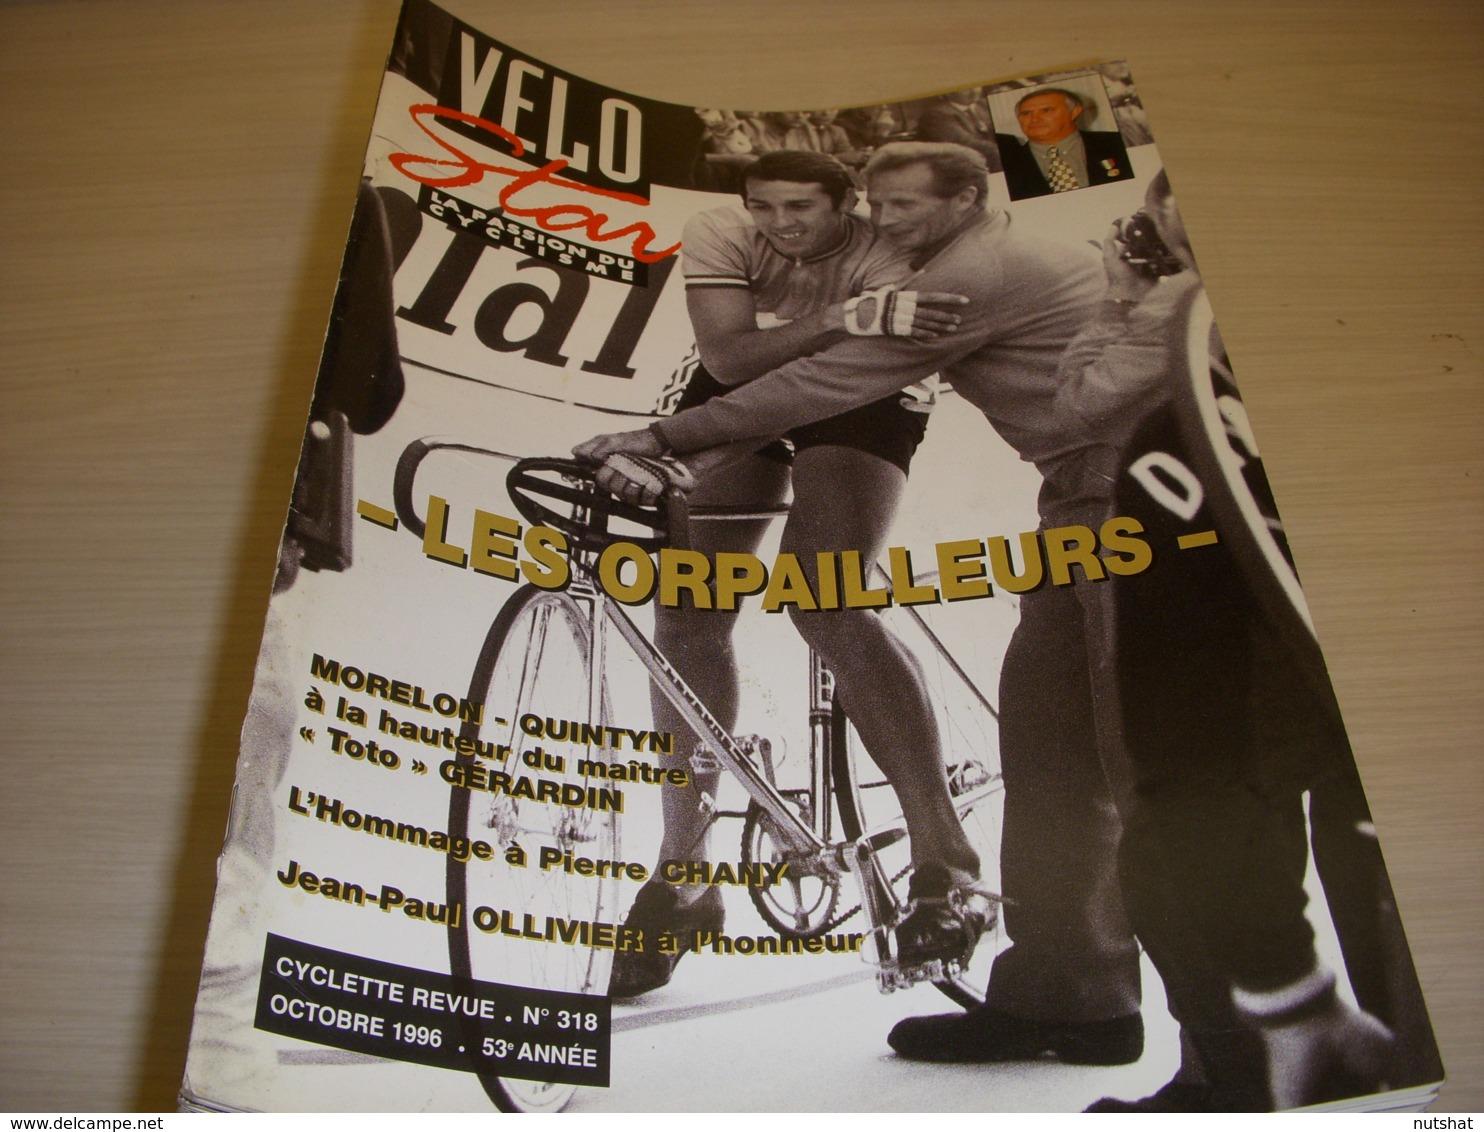 CYCLISME VELO STAR 318 10.1996 La PISTE MORELON QUINTYN HOMMAGE à PIERRE CHANY - Deportes